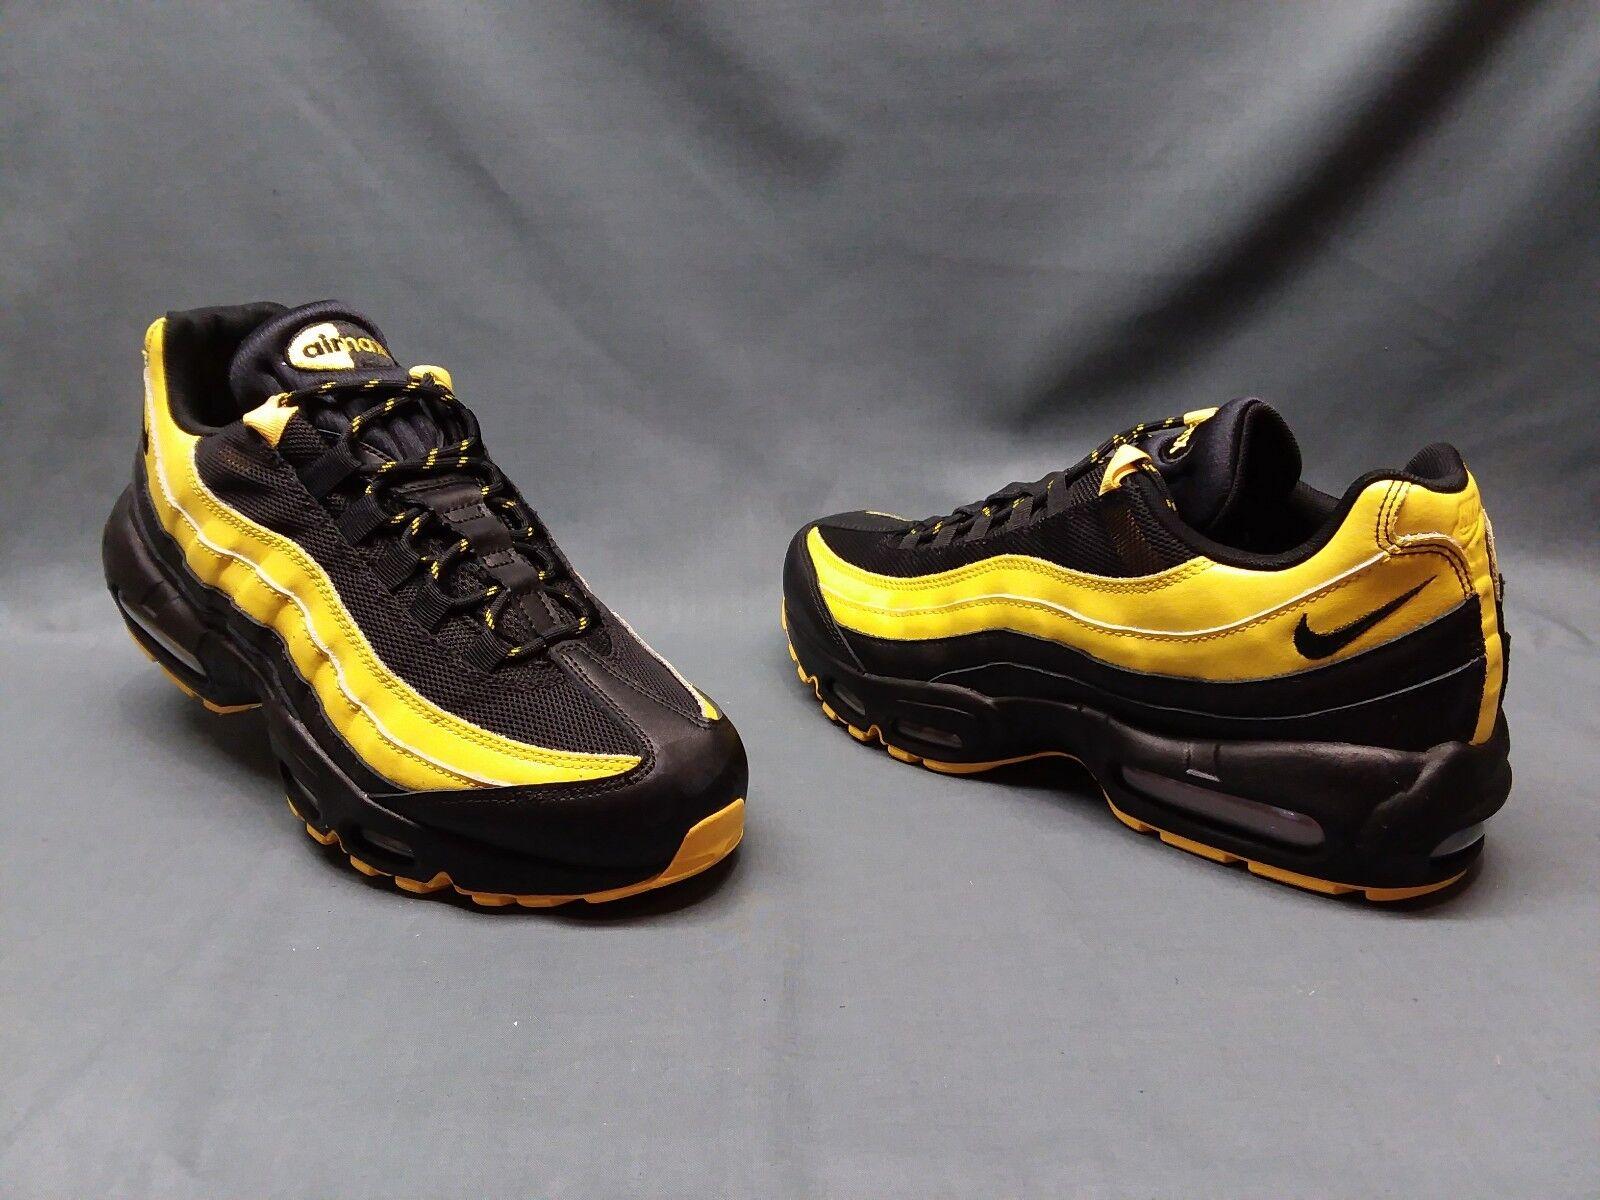 Nike frequenz air max 95 frequenz Nike  packen an schwarz - gelb 11 nwob! 5edffc